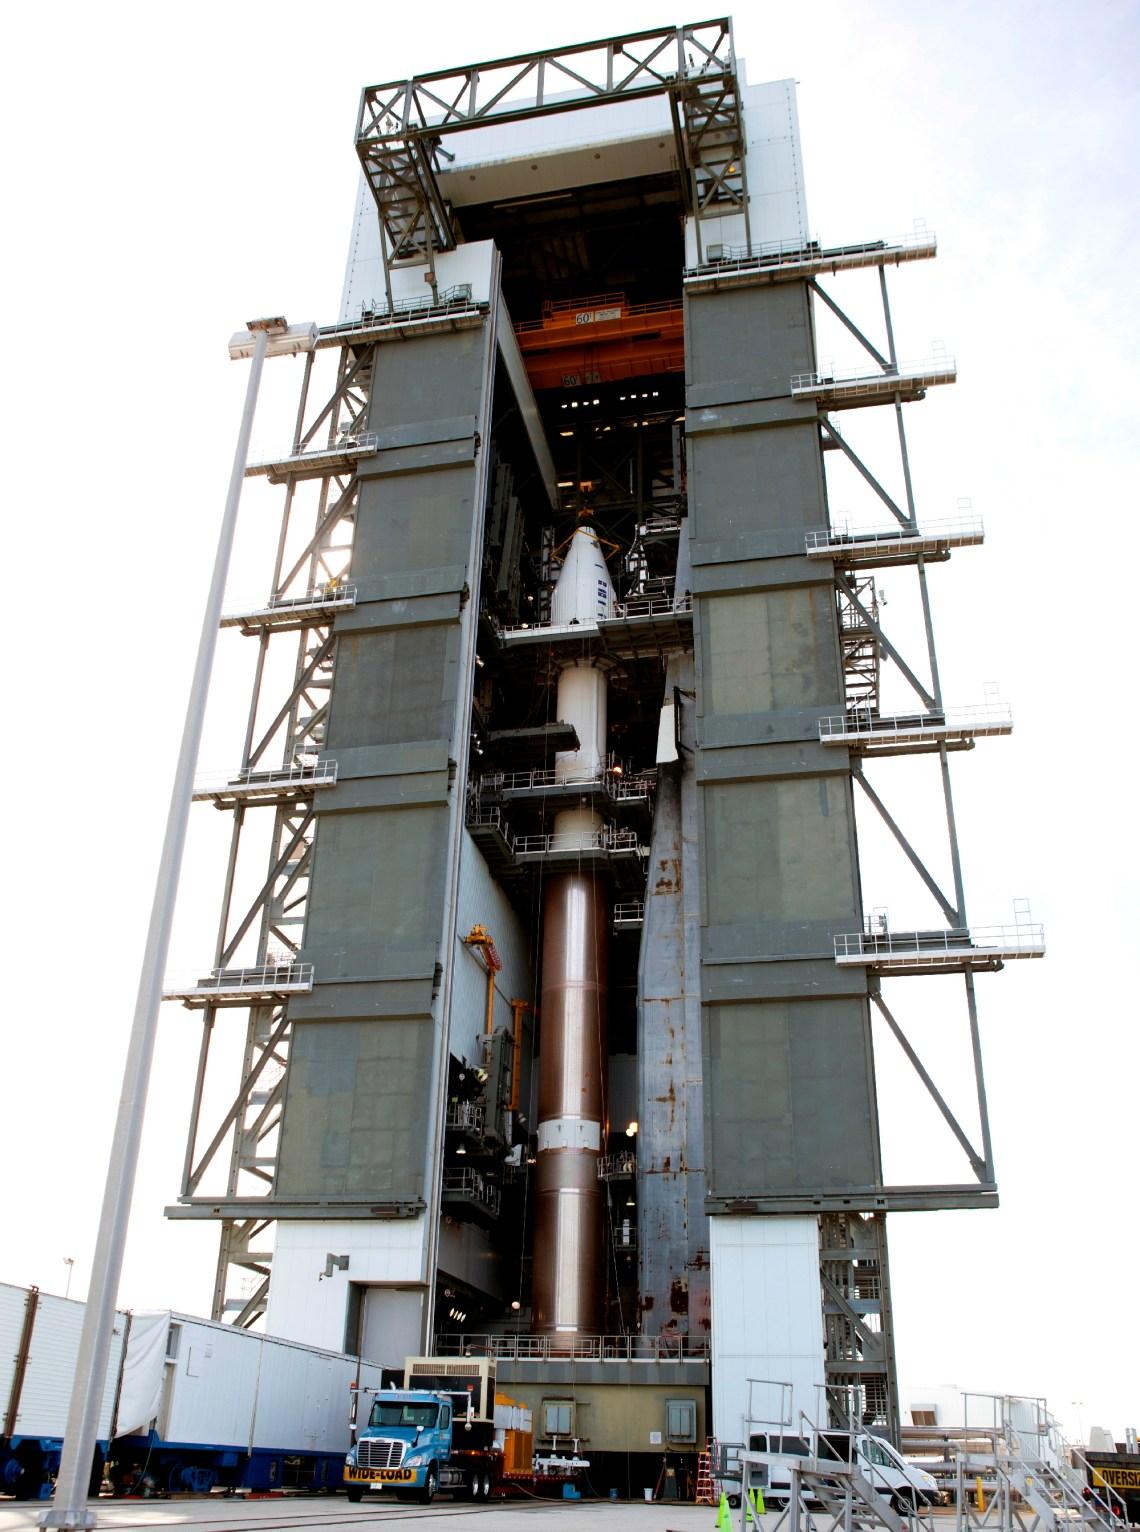 TDRS-L Atop Atlas V